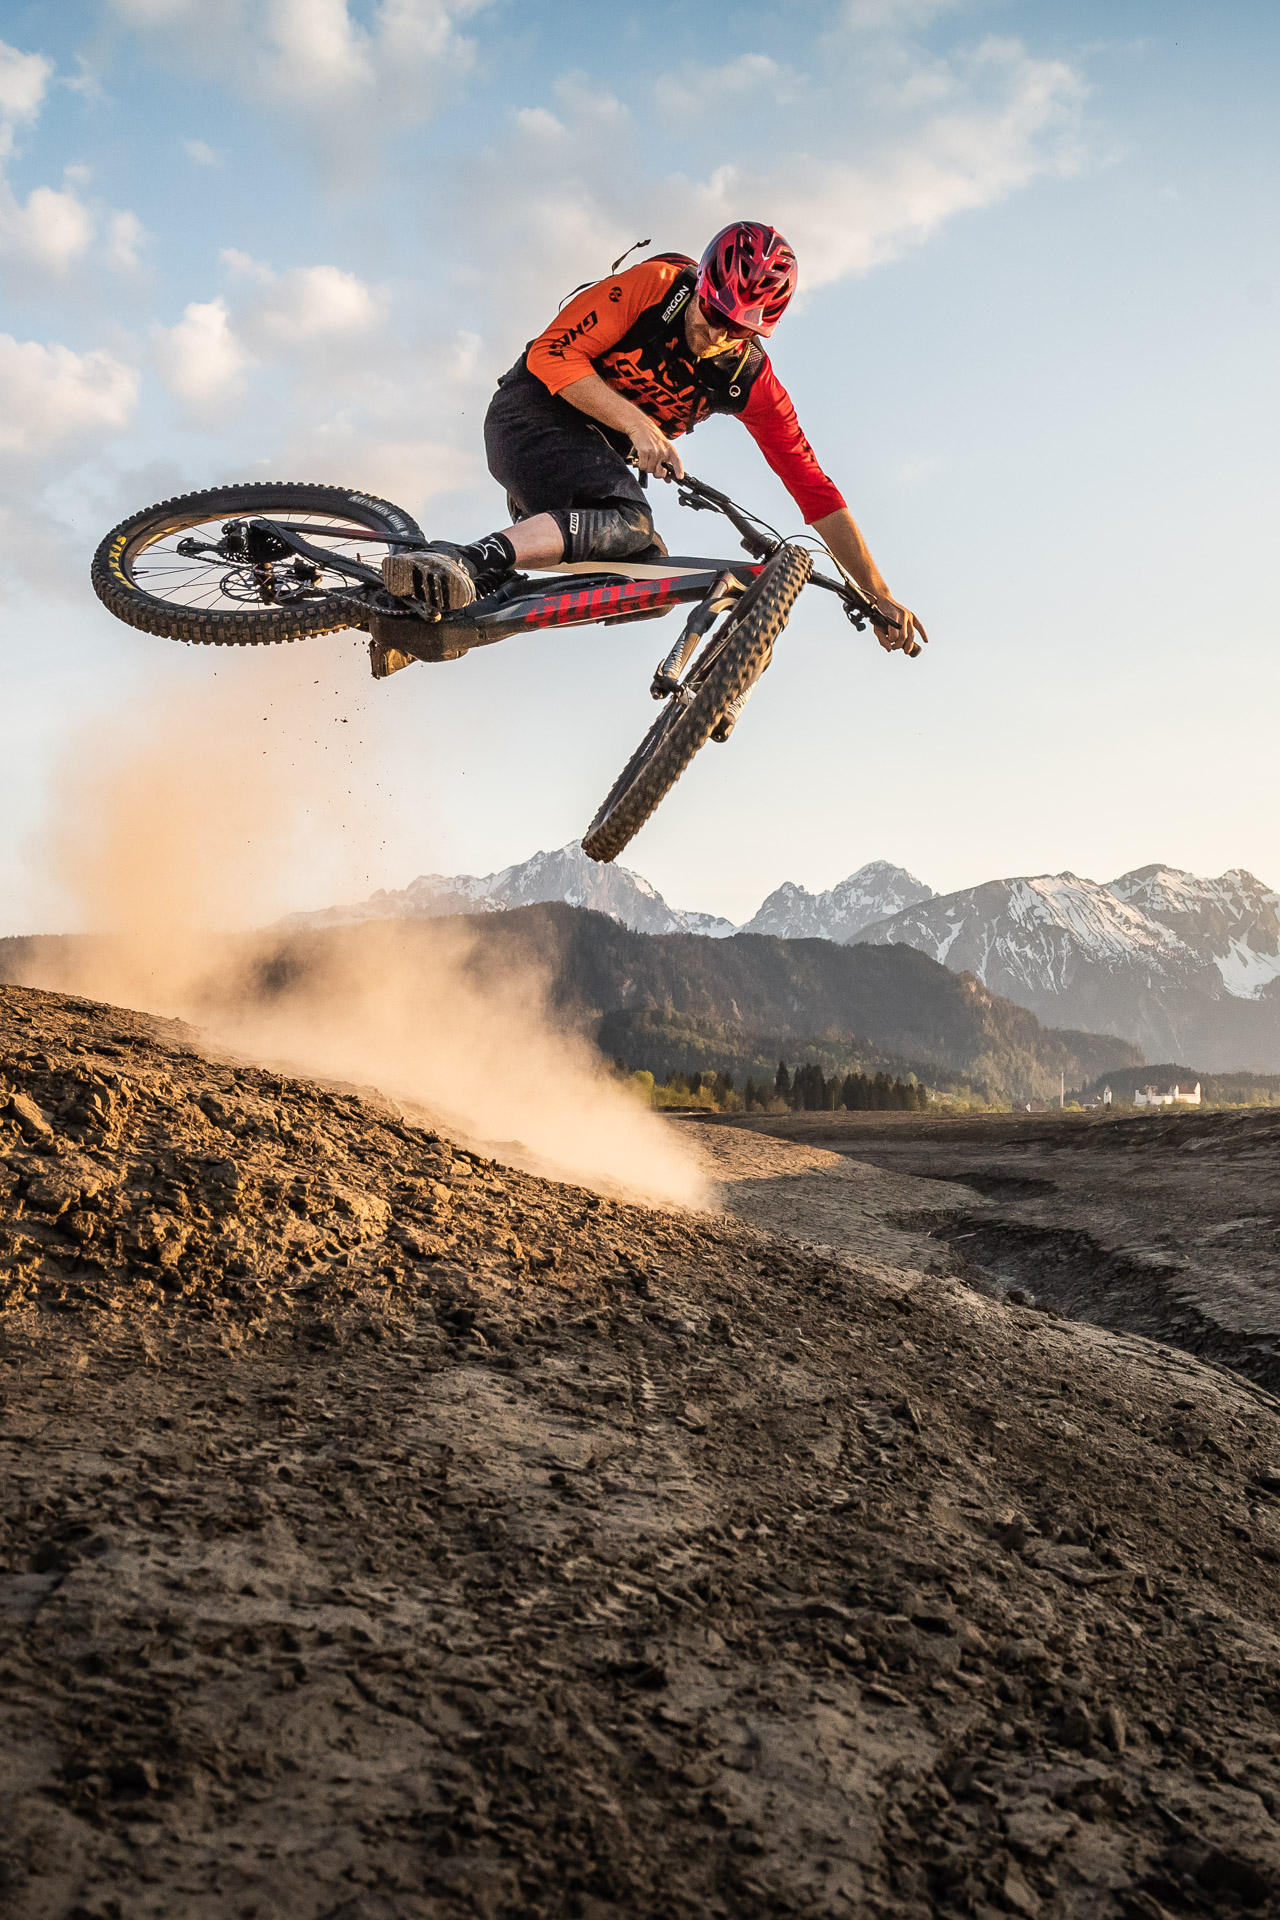 GHOST-Bikes-Hybride-Slamrx-Forggensee-2018-_MG_1161